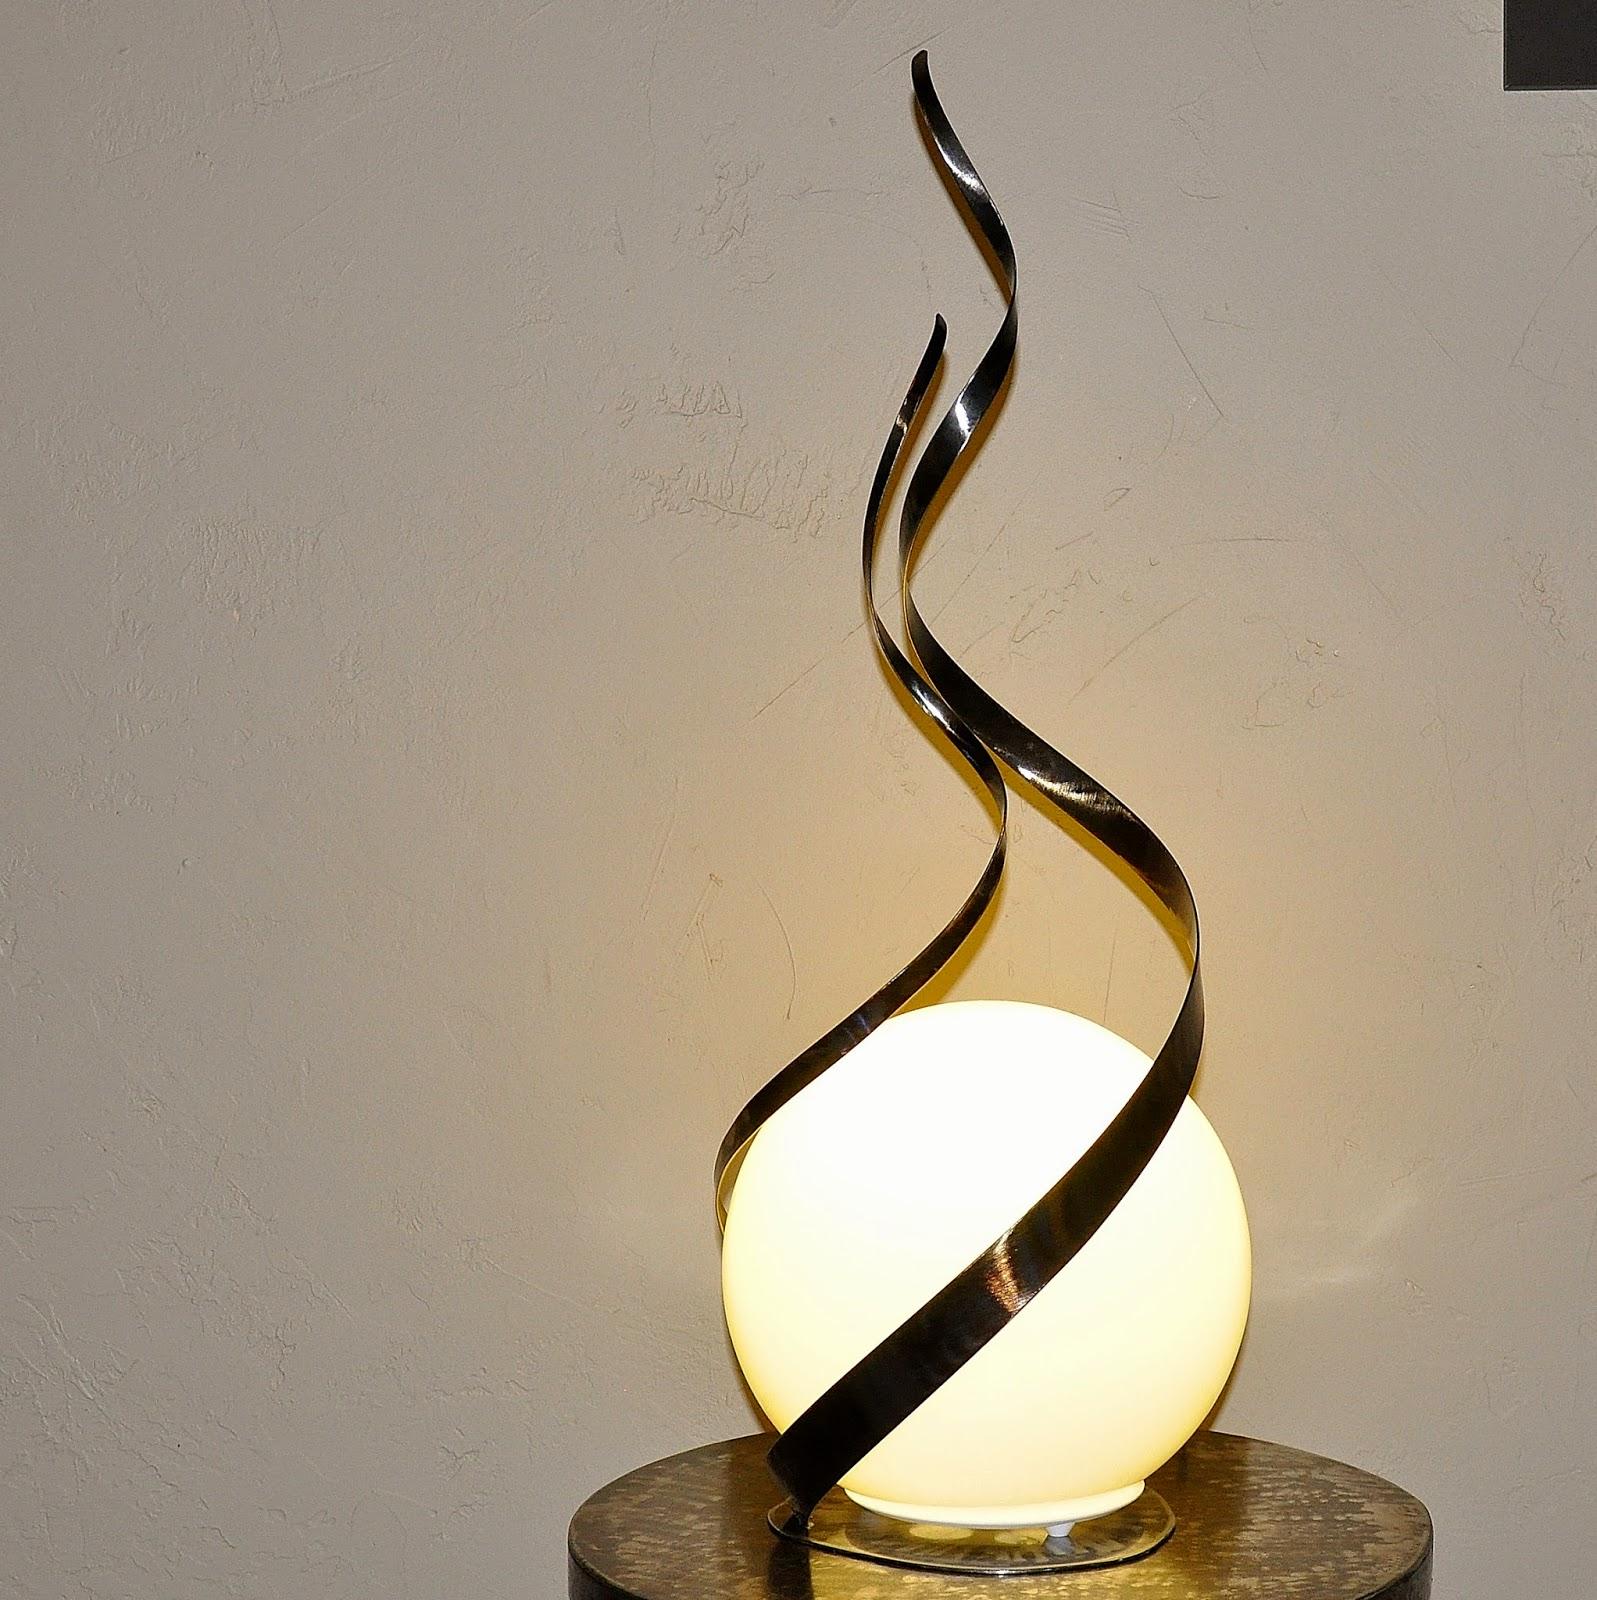 cr ateur d 39 objets d co en fer forg bougeoirs luminaires porte bouteille des id es cadeau. Black Bedroom Furniture Sets. Home Design Ideas